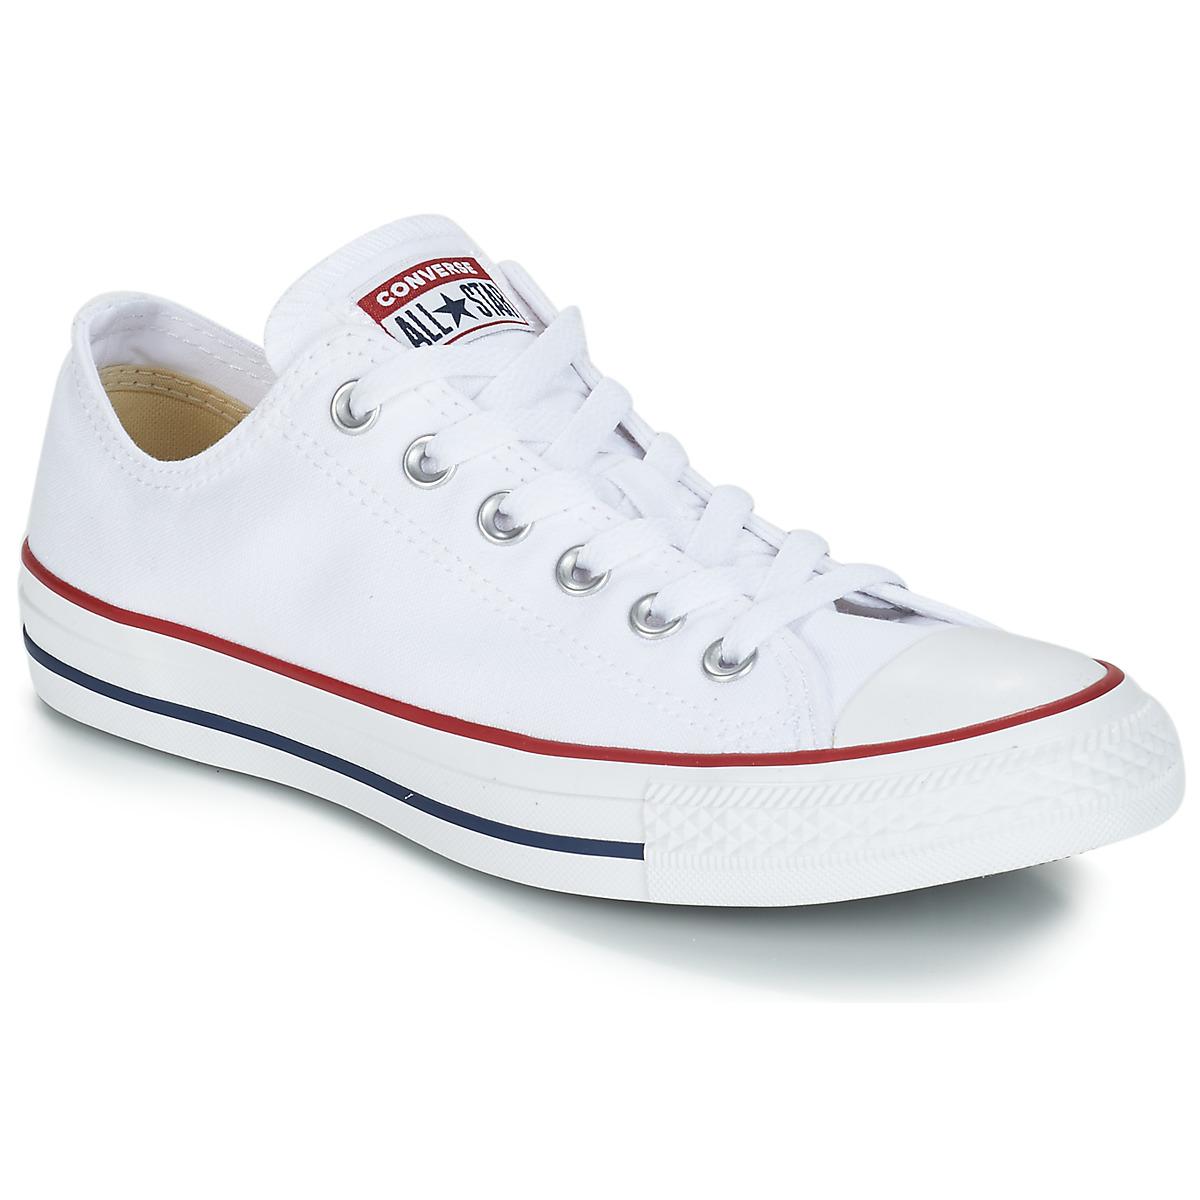 fdacb7700d3 Converse CHUCK TAYLOR ALL STAR CORE OX Branco - Entrega gratuita com a  Spartoo.pt ! - Sapatos Sapatilhas 67